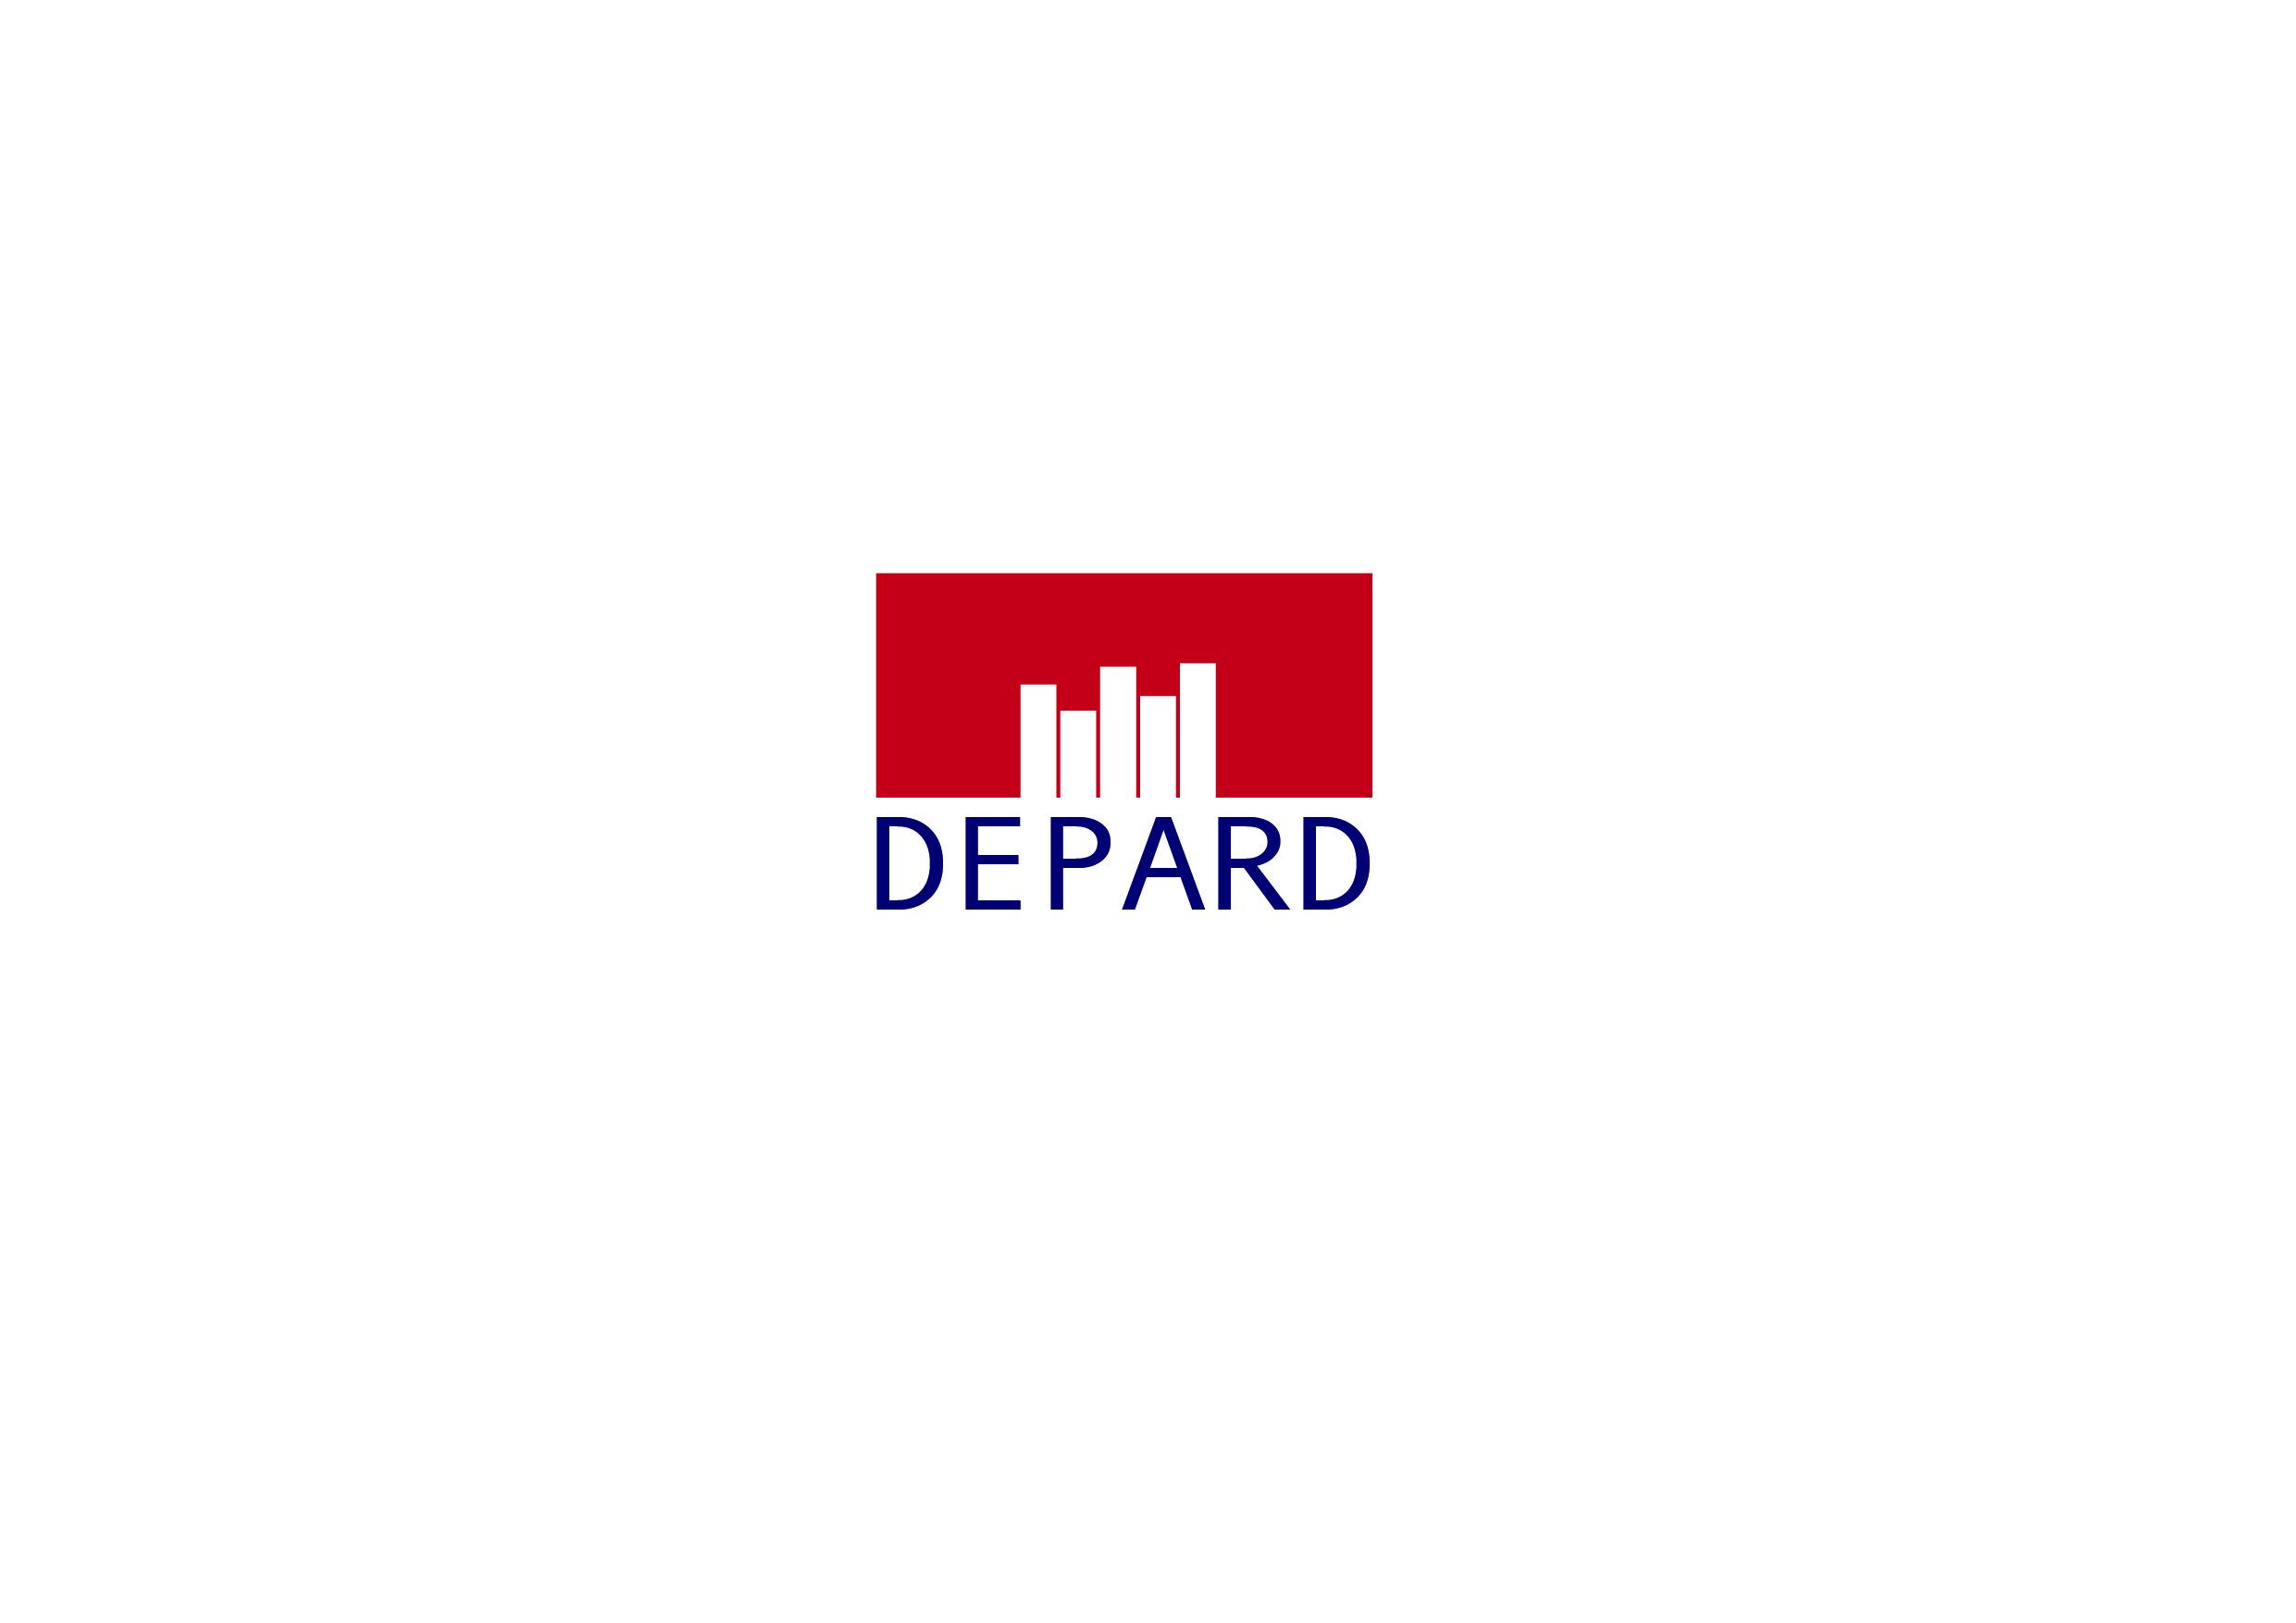 Логотип для компании (услуги недвижимость) фото f_233593098682146d.jpg